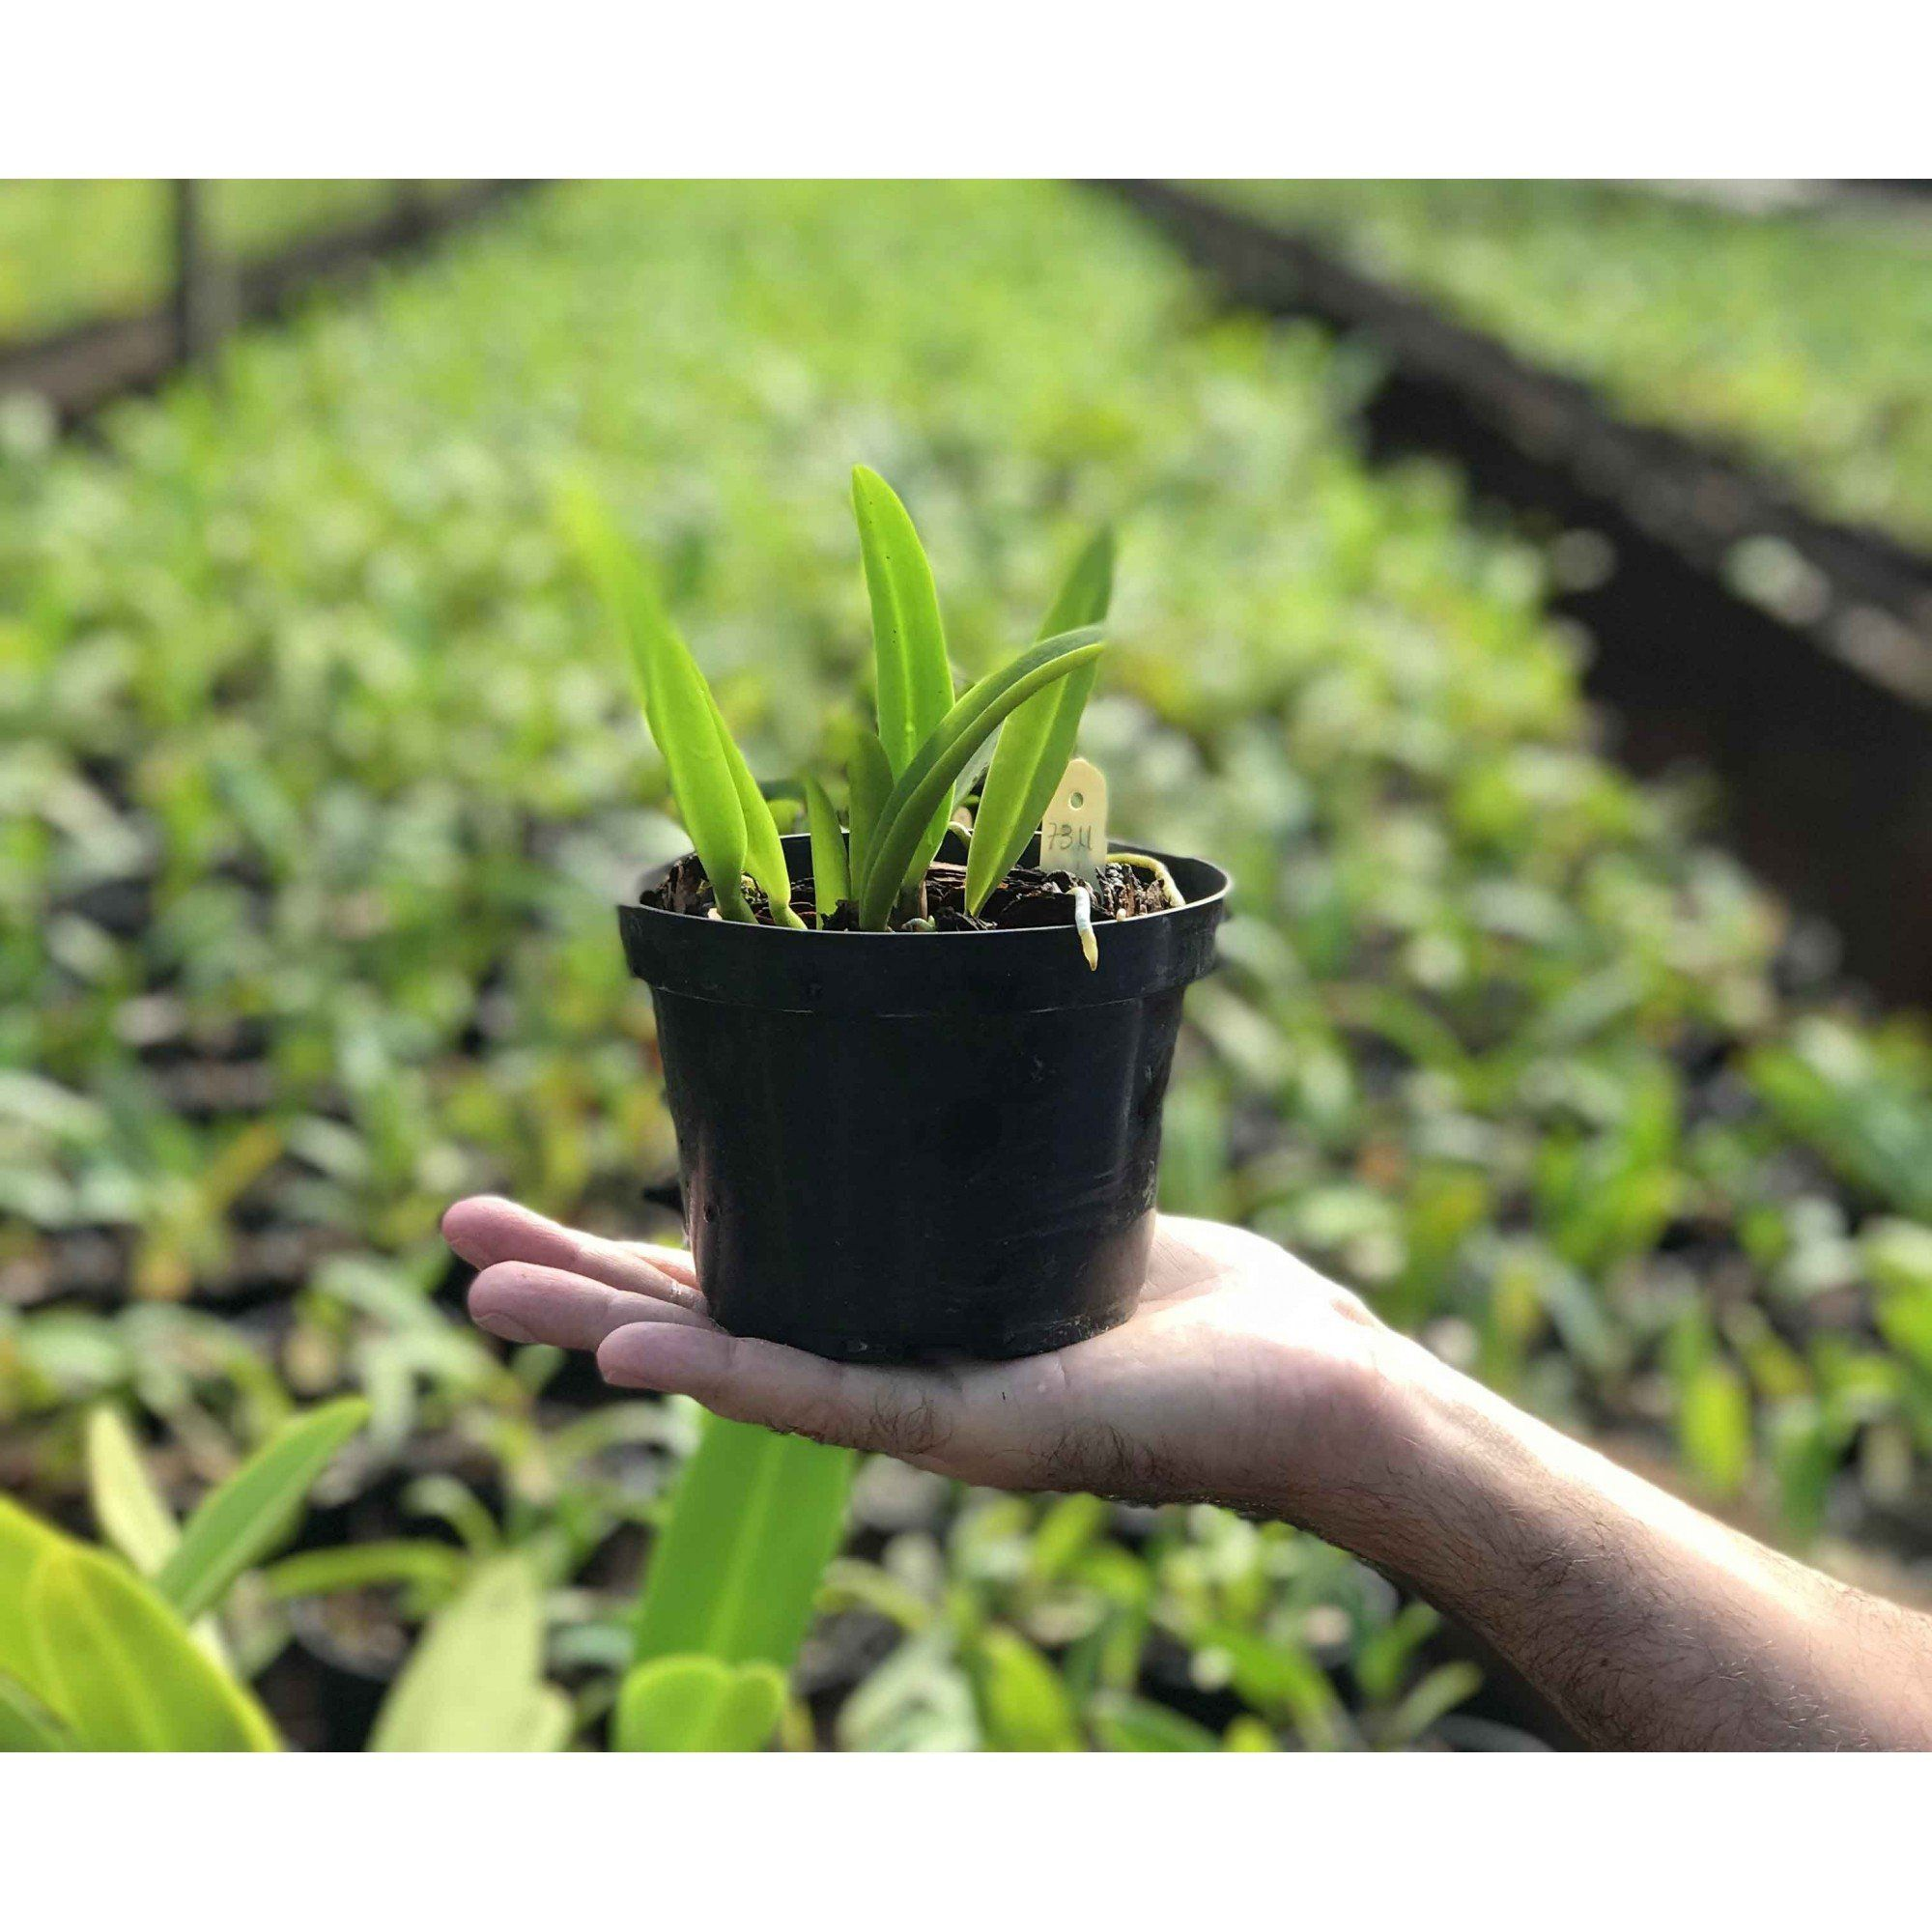 Muda de Orquídea Cattleya SSC Nº 2187 Pot. Sally Taylor Red HCC/AOS x Blc. Owen Holmes Ponkan AM/AOS x SSC Nº 2000 7311